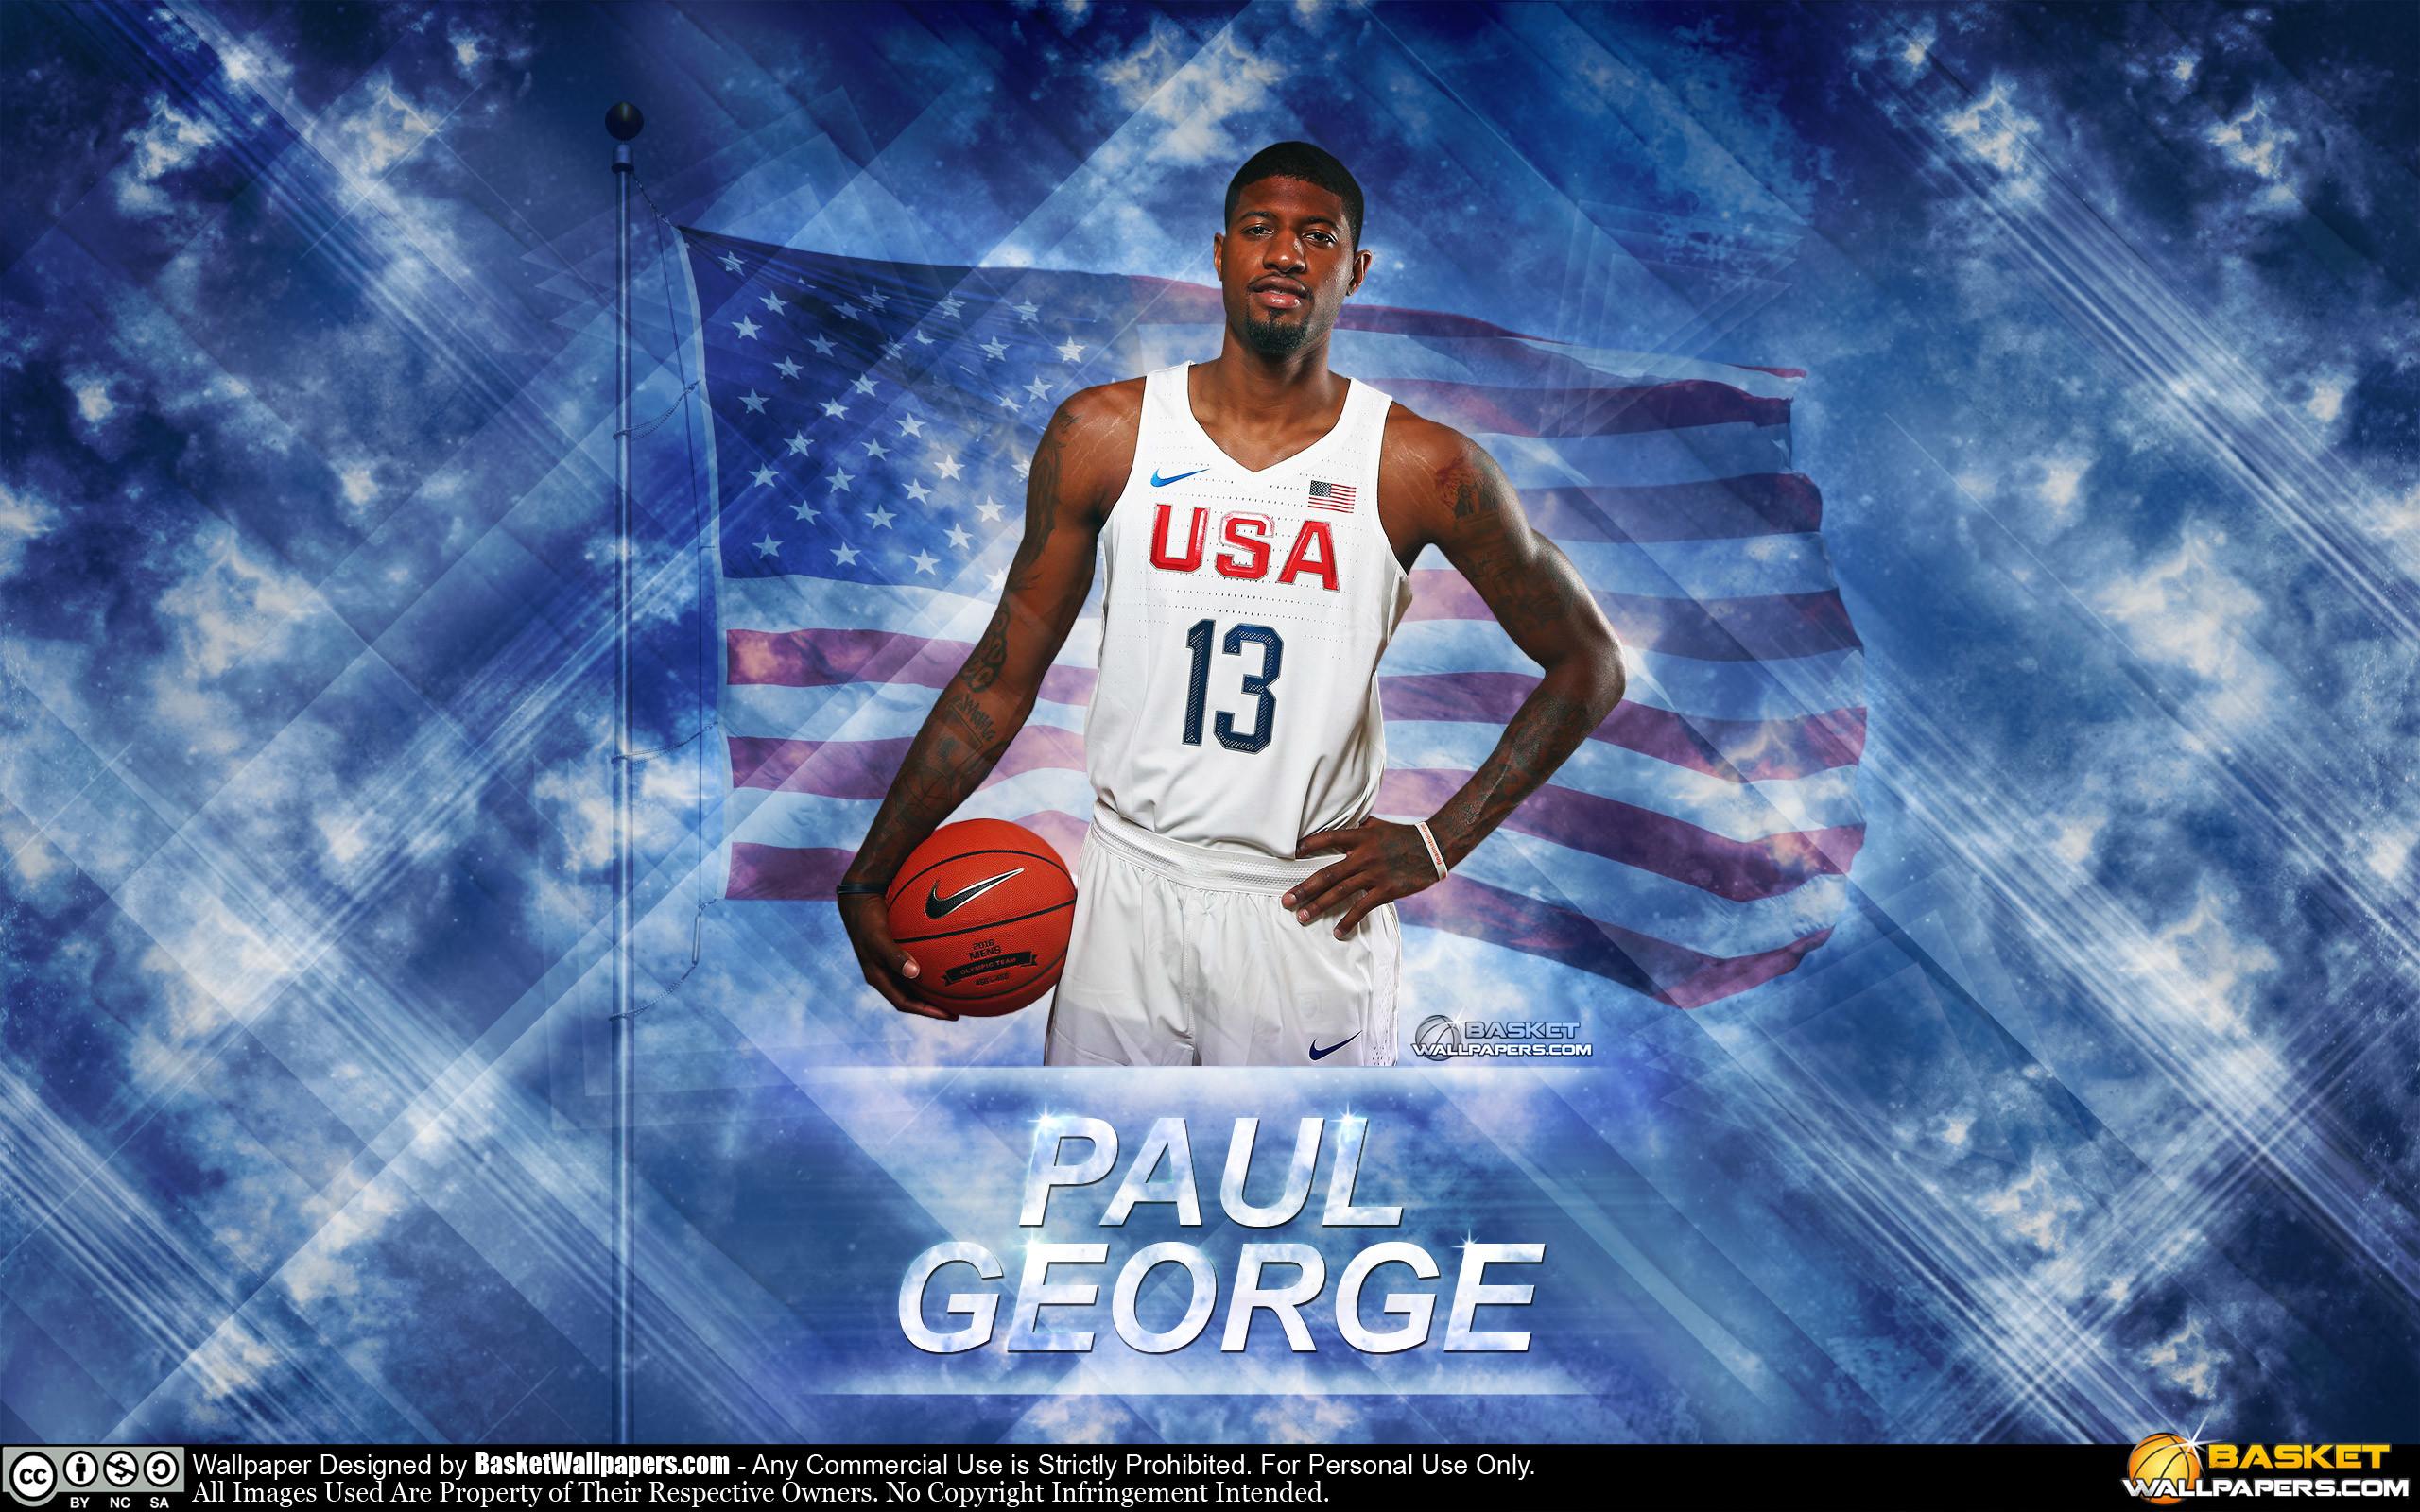 Nba basketball wallpaper 2018 63 images 2560x1600 paul george usa 2016 olympics wallpaper voltagebd Choice Image